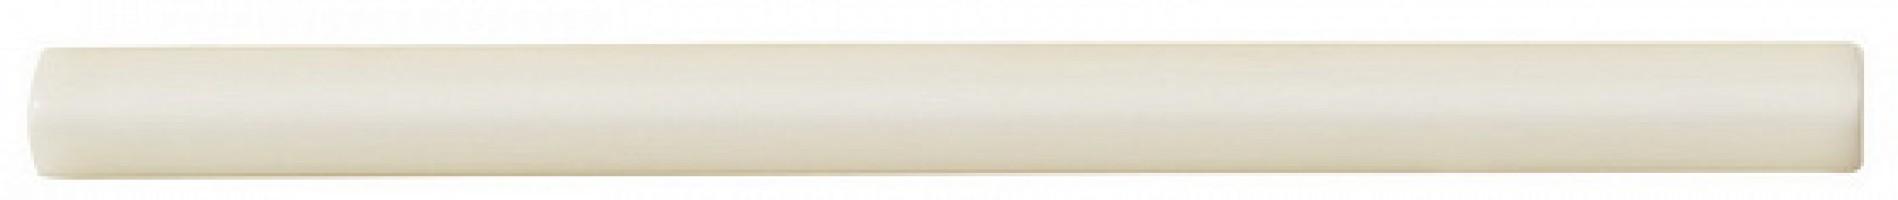 Бордюр Studio ADST5233 Bullnose Trim Almond 0.75x14.8 Adex